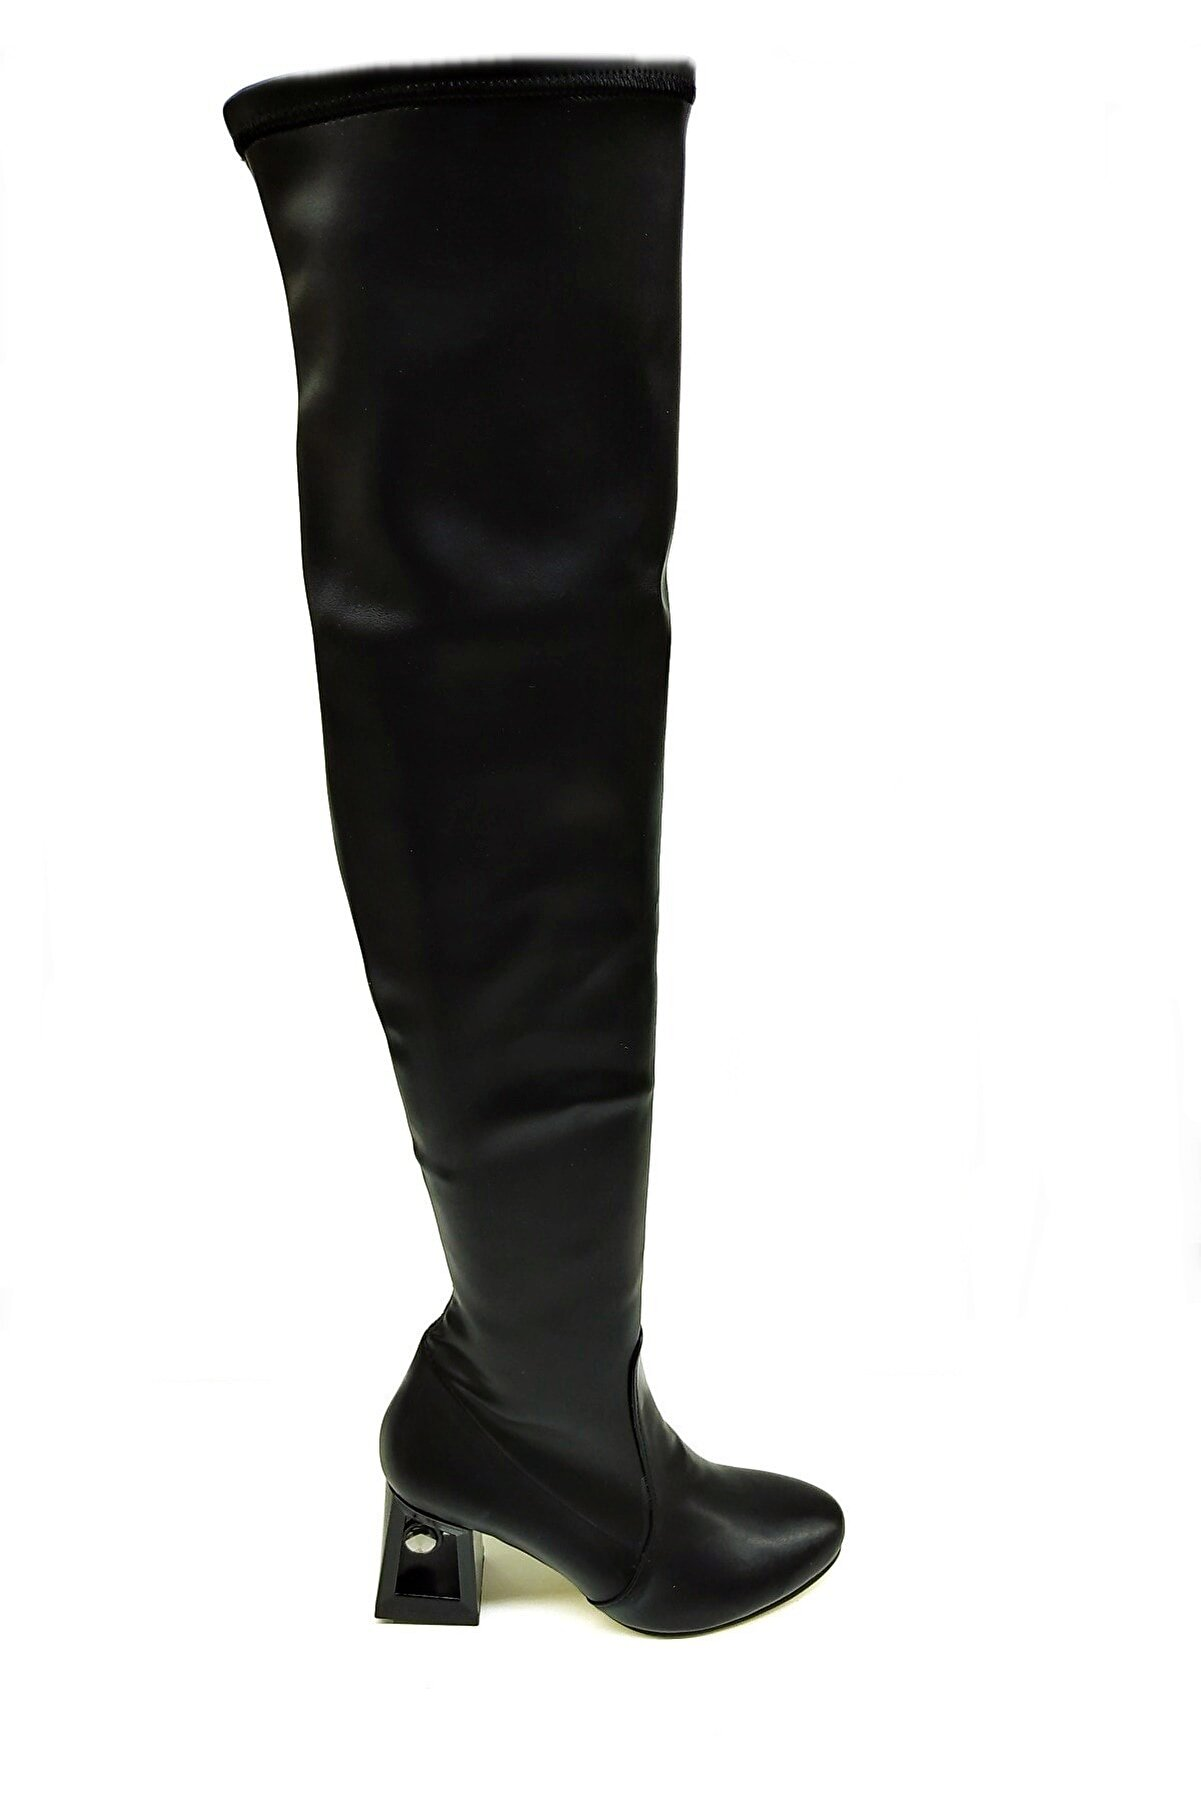 Heels Siyah Kadın Diz Üstü Çizme